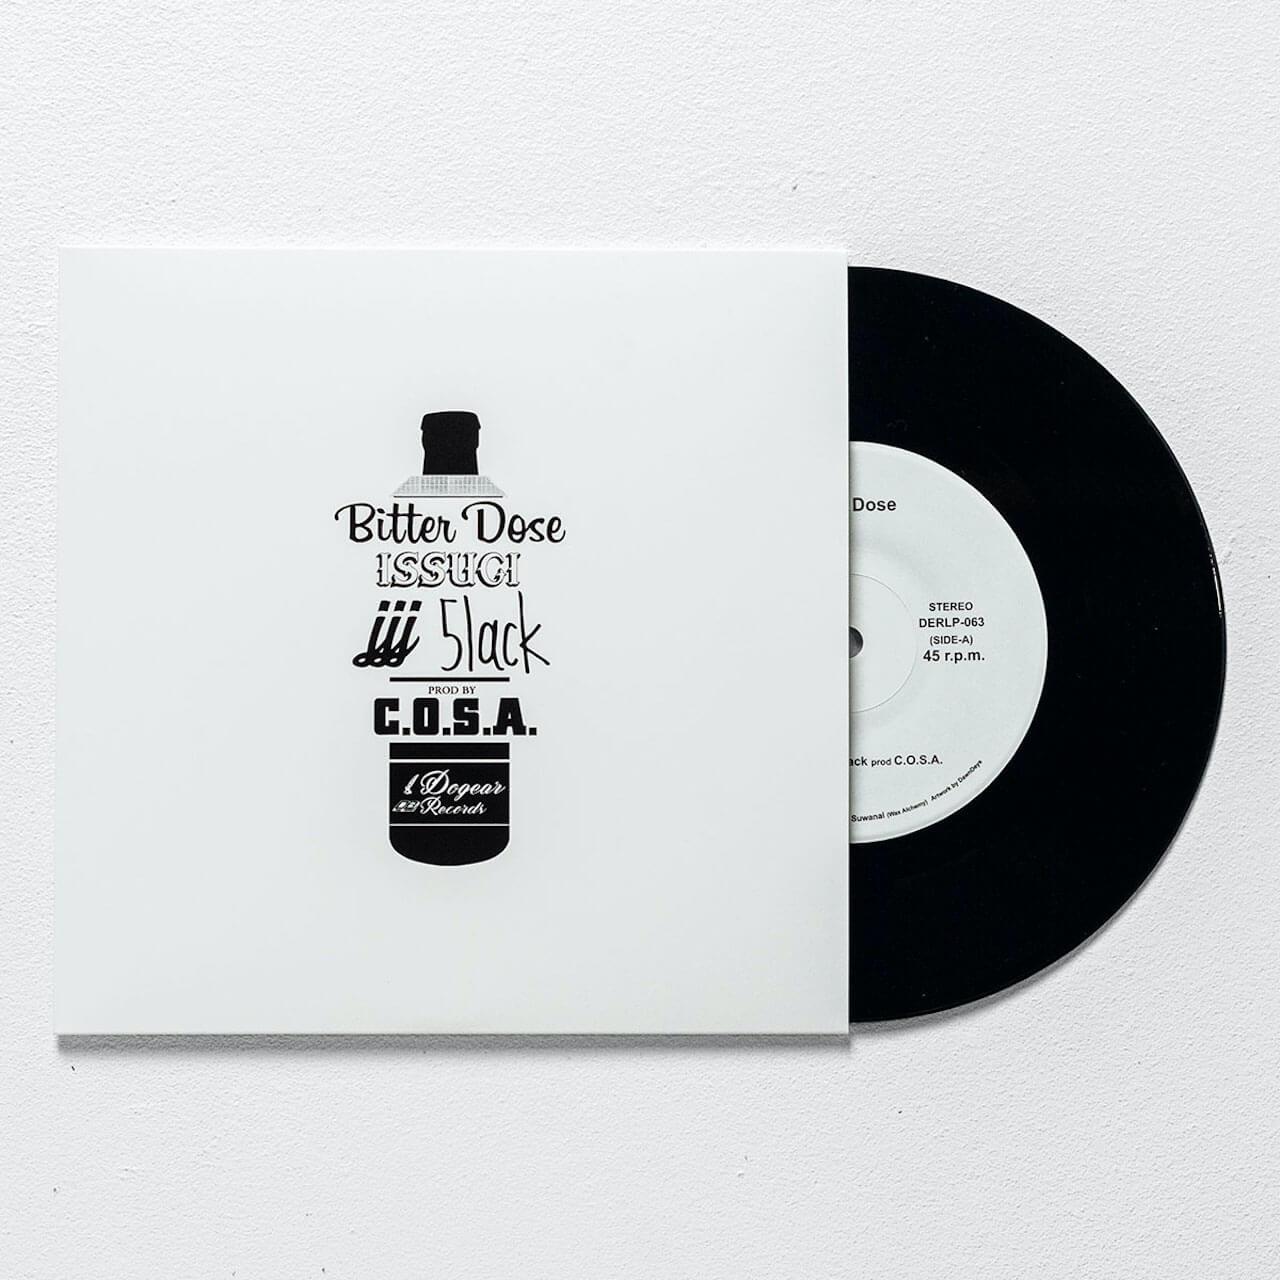 ISSUGI、JJJ、5lackによるシングル「Bitter Dose」prod C.O.S.A.が7インチでリリース music201023-issugi-jjj-5lack-cosa-3